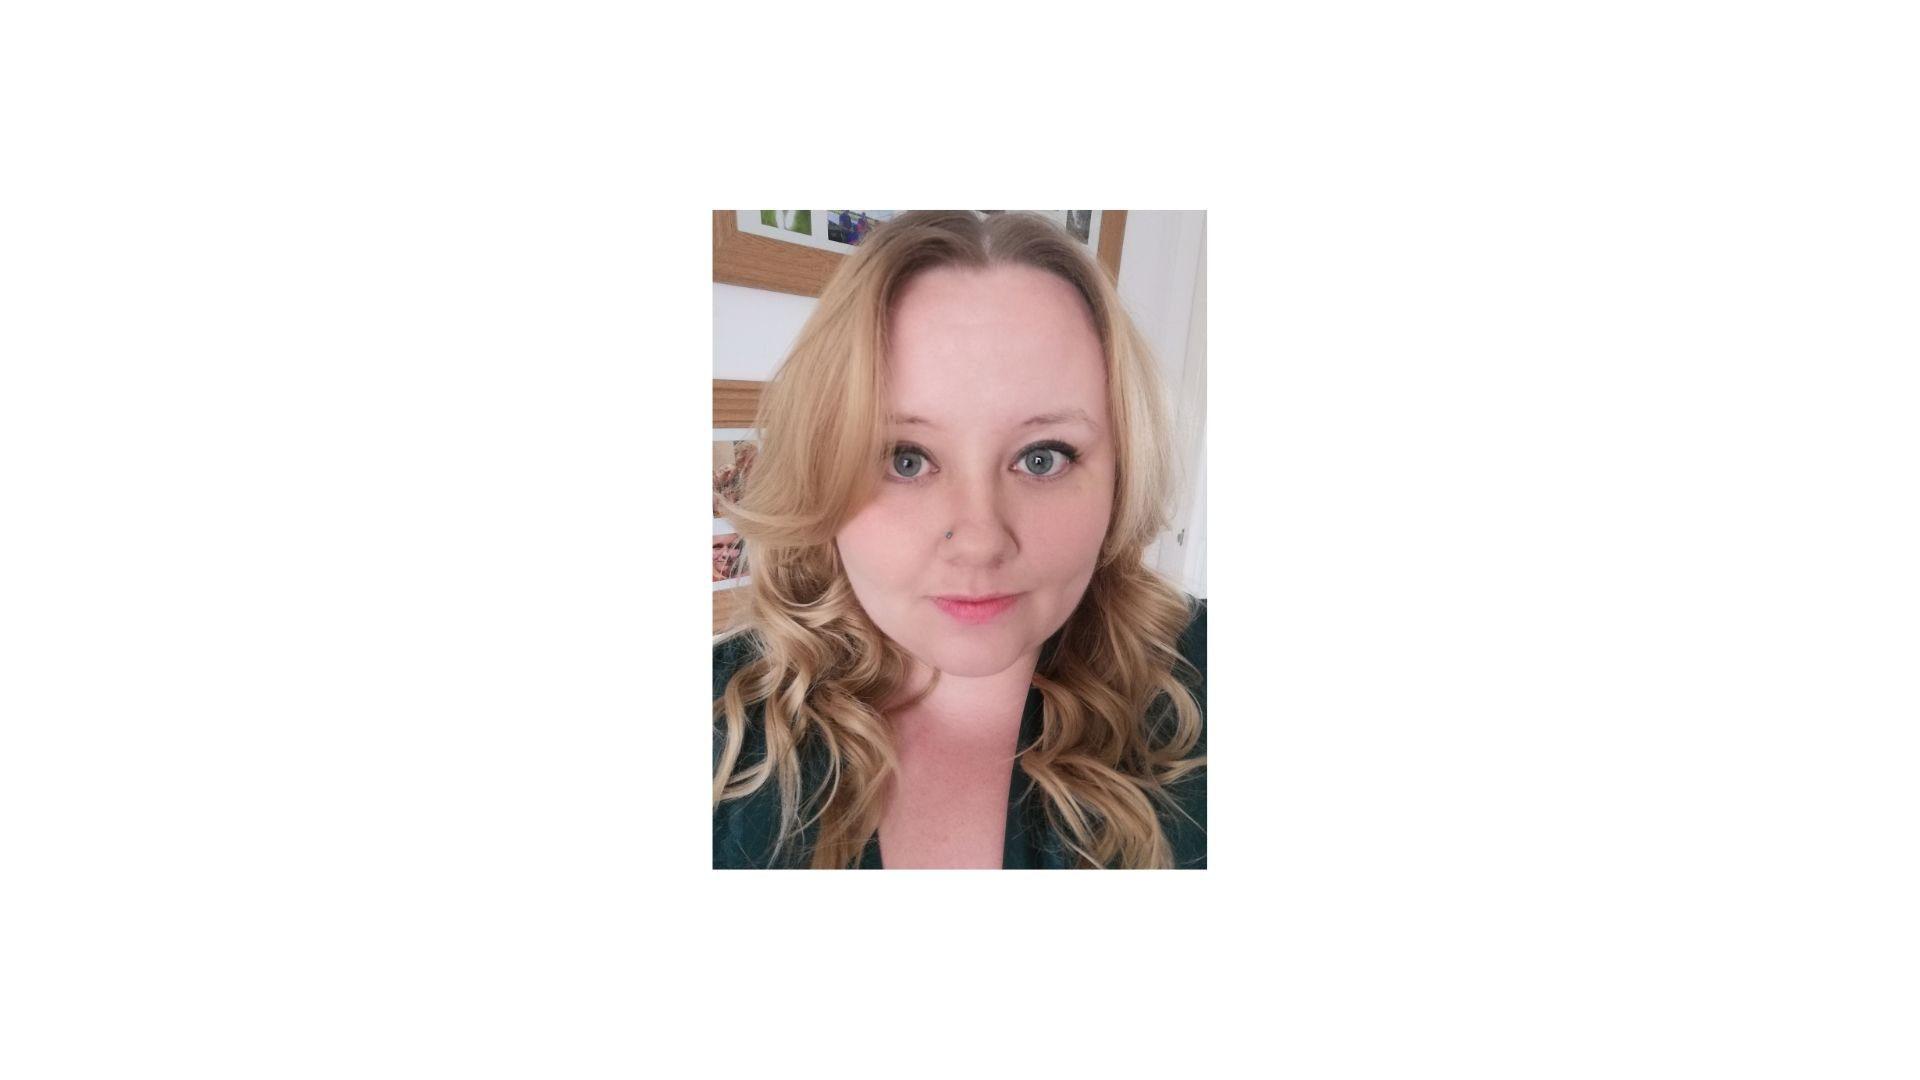 Aspiring midwife pursues her dreams